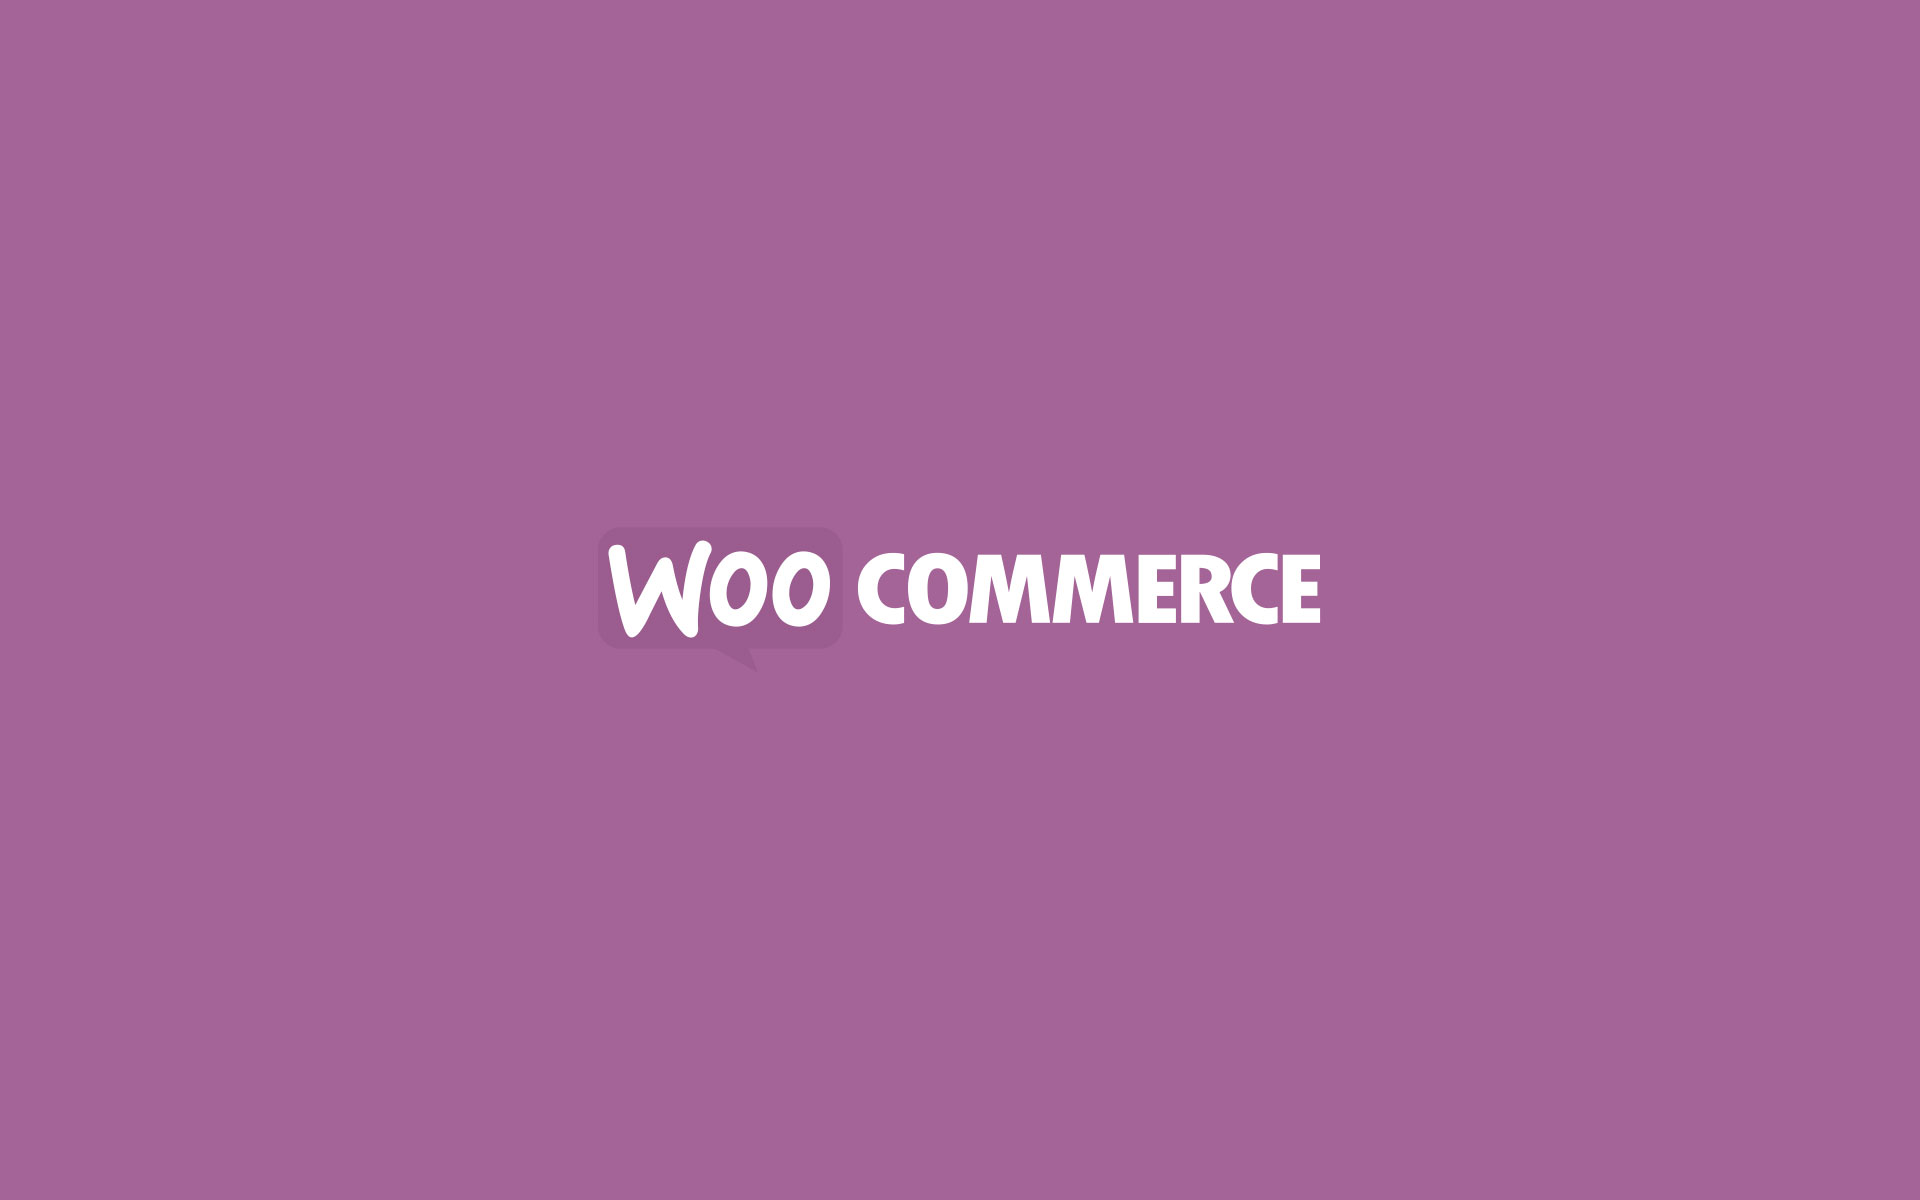 WooCommerce: sottrarre un importo al totale del carrello